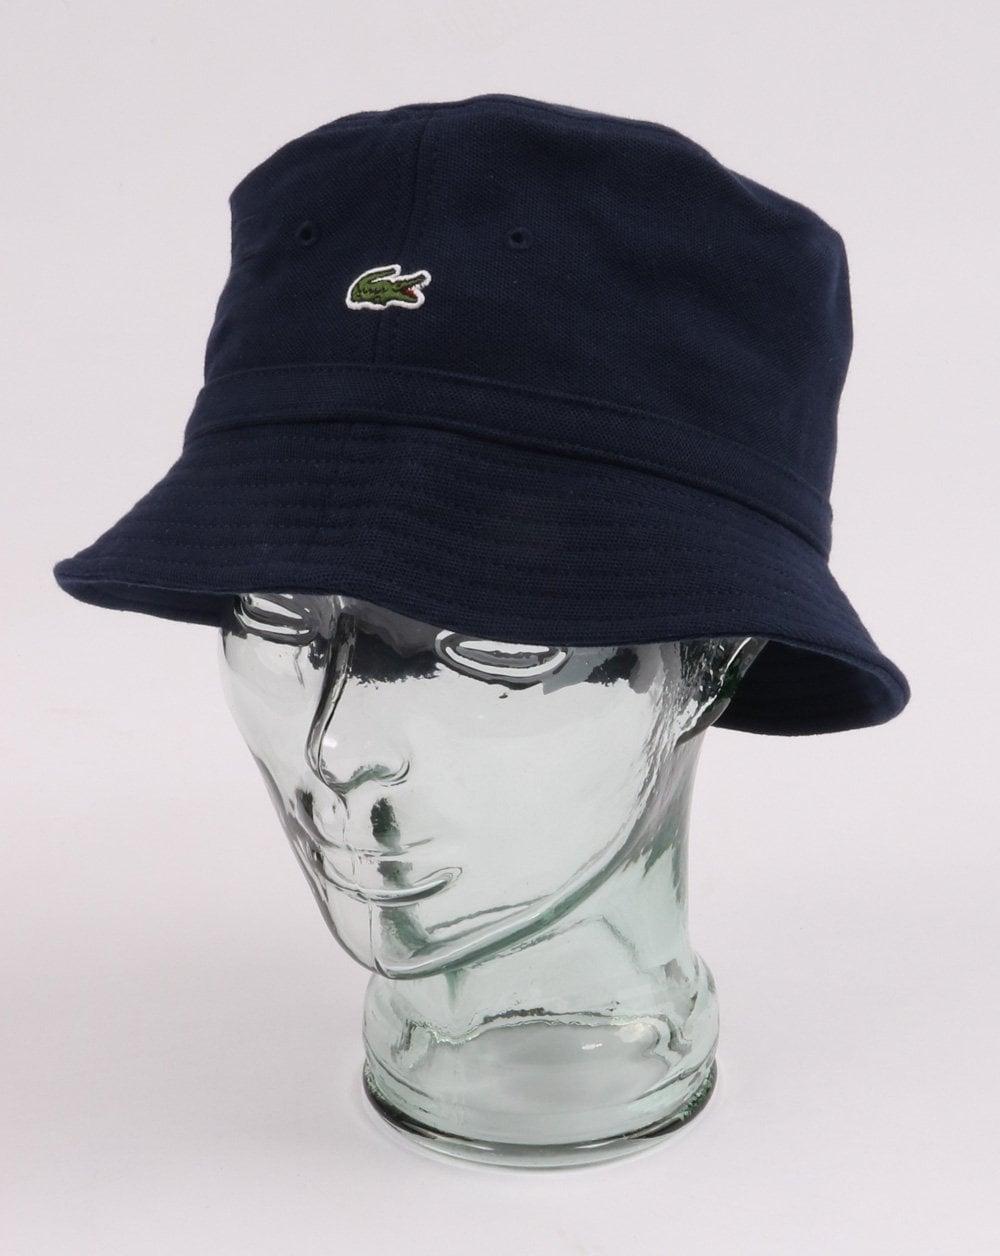 lacoste bucket hat navy